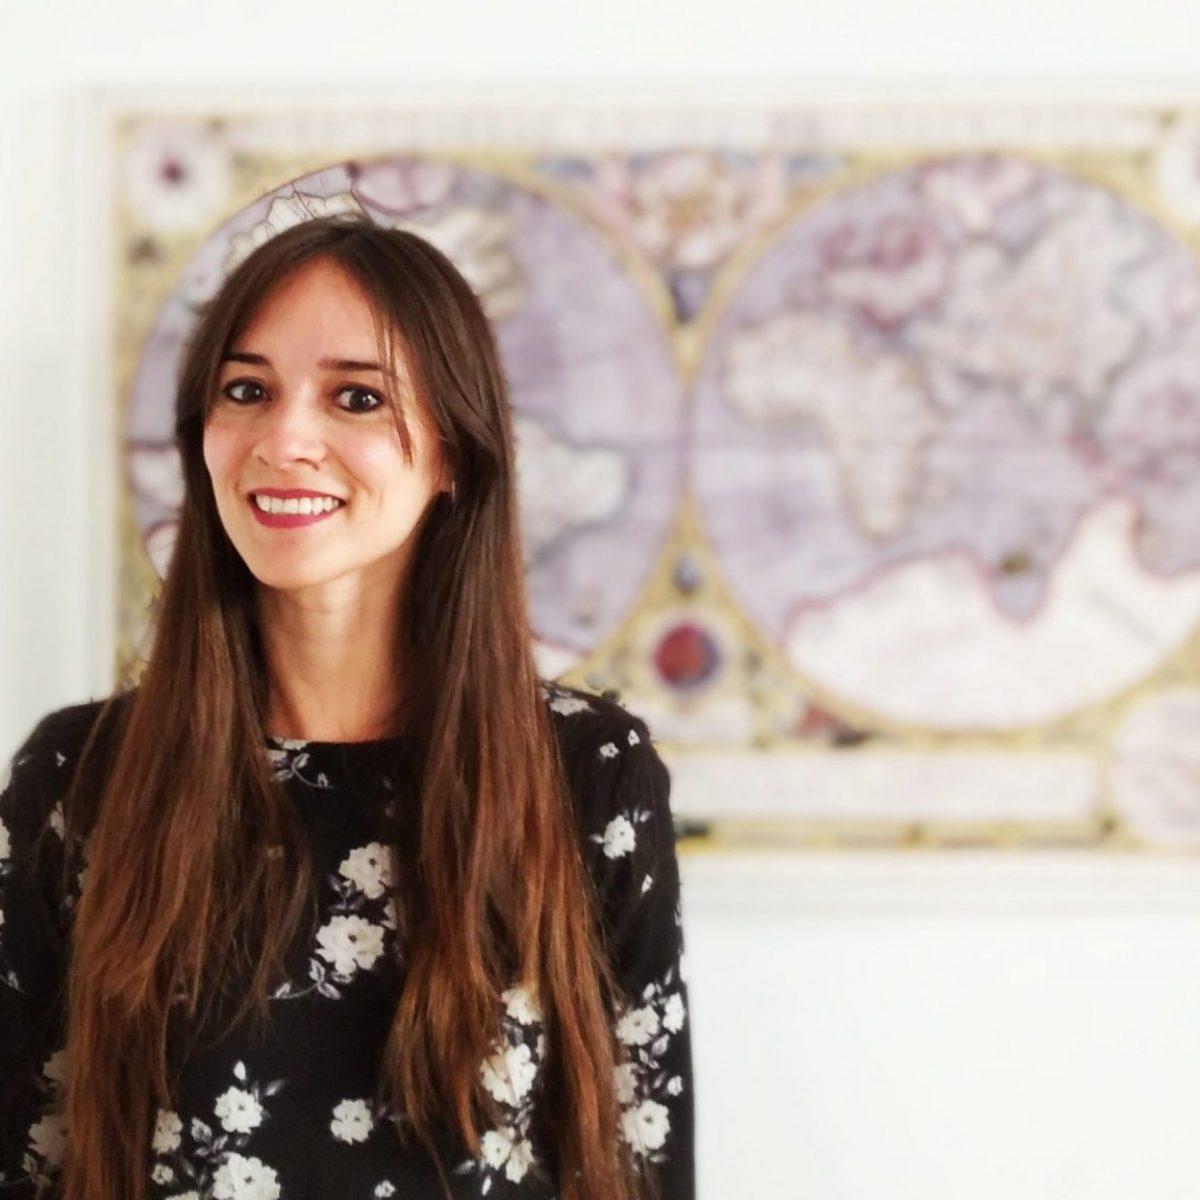 Laura Areiza